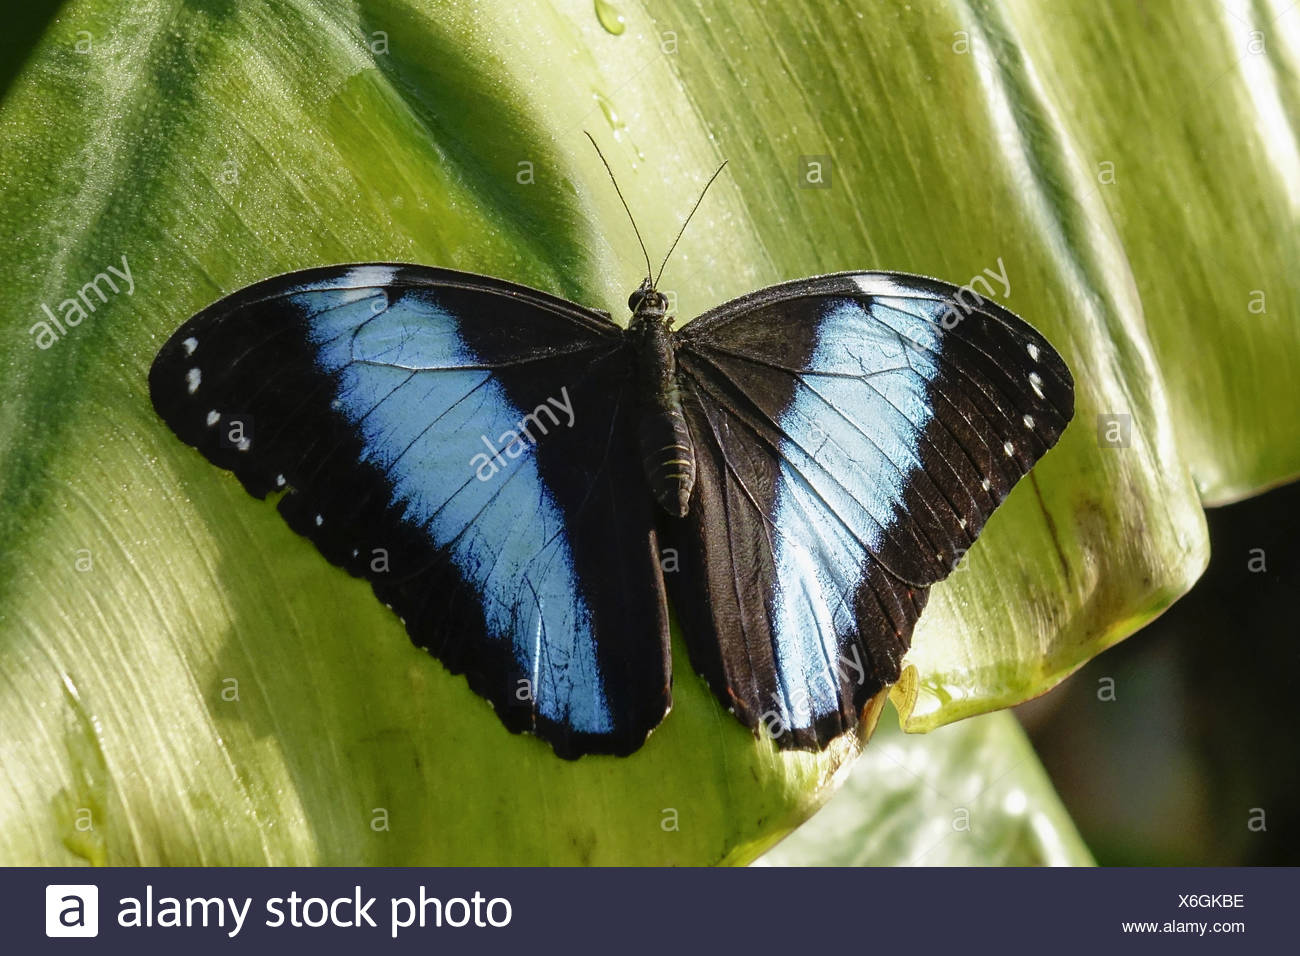 Tropischer Schmetterling, Blauer Morphofalter (Morpho peleides) Stock Photo